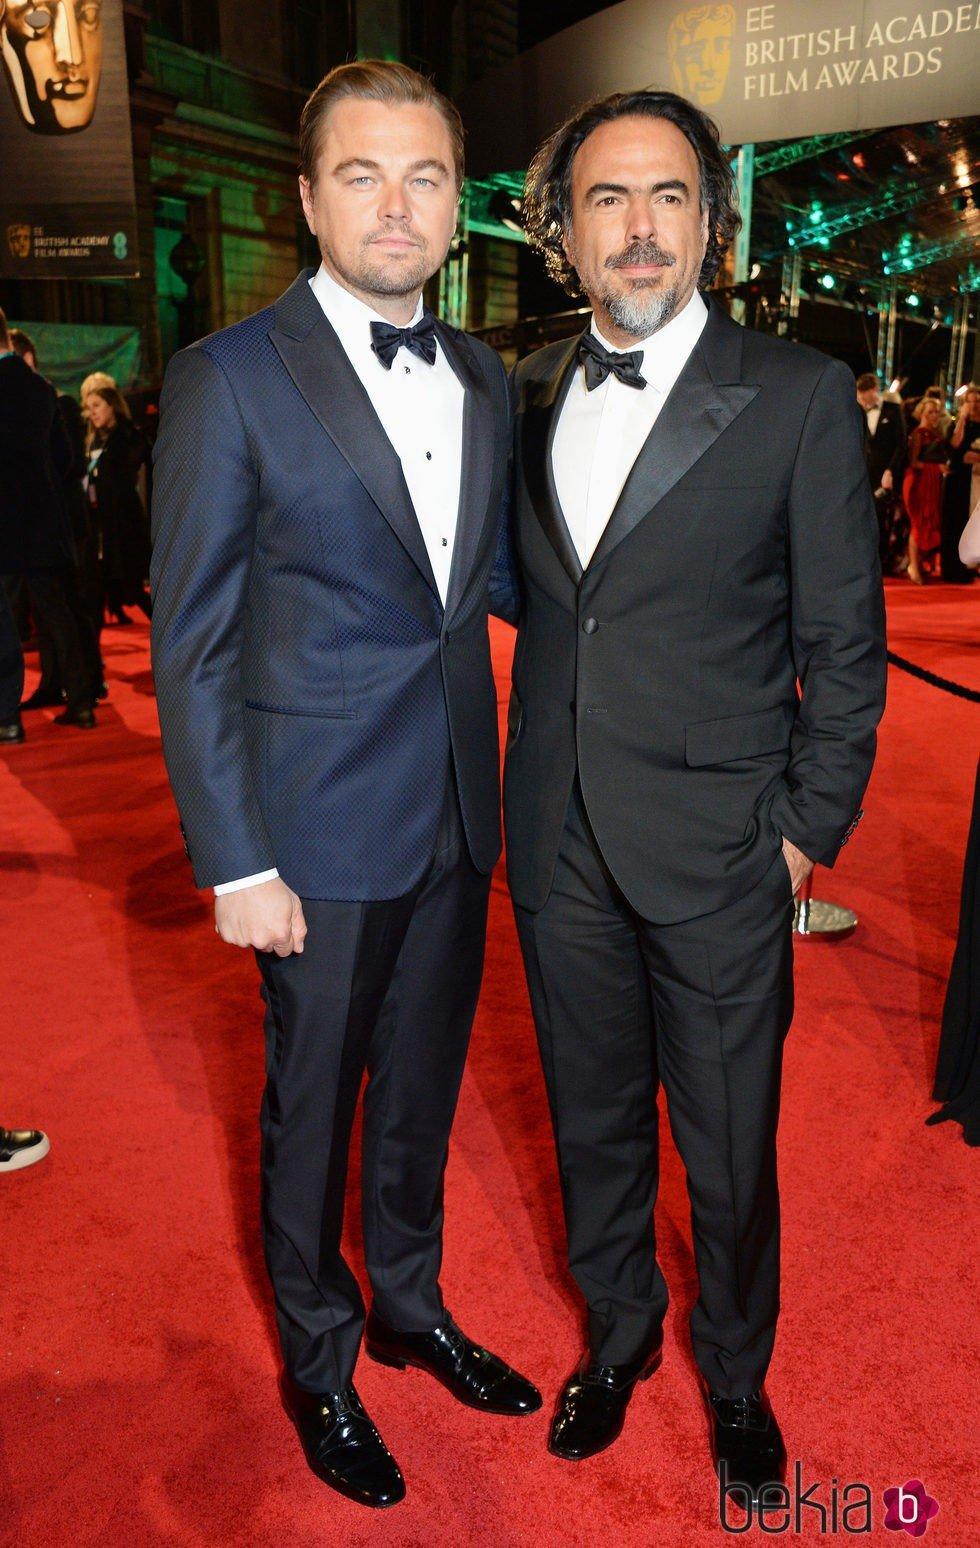 ¿Cuánto mide Alejandro González Iñárritu? - Real height 86527_leonardo-dicaprio-alejandro-gonzalez-inarritu-alfombra-roja-bafta-2016